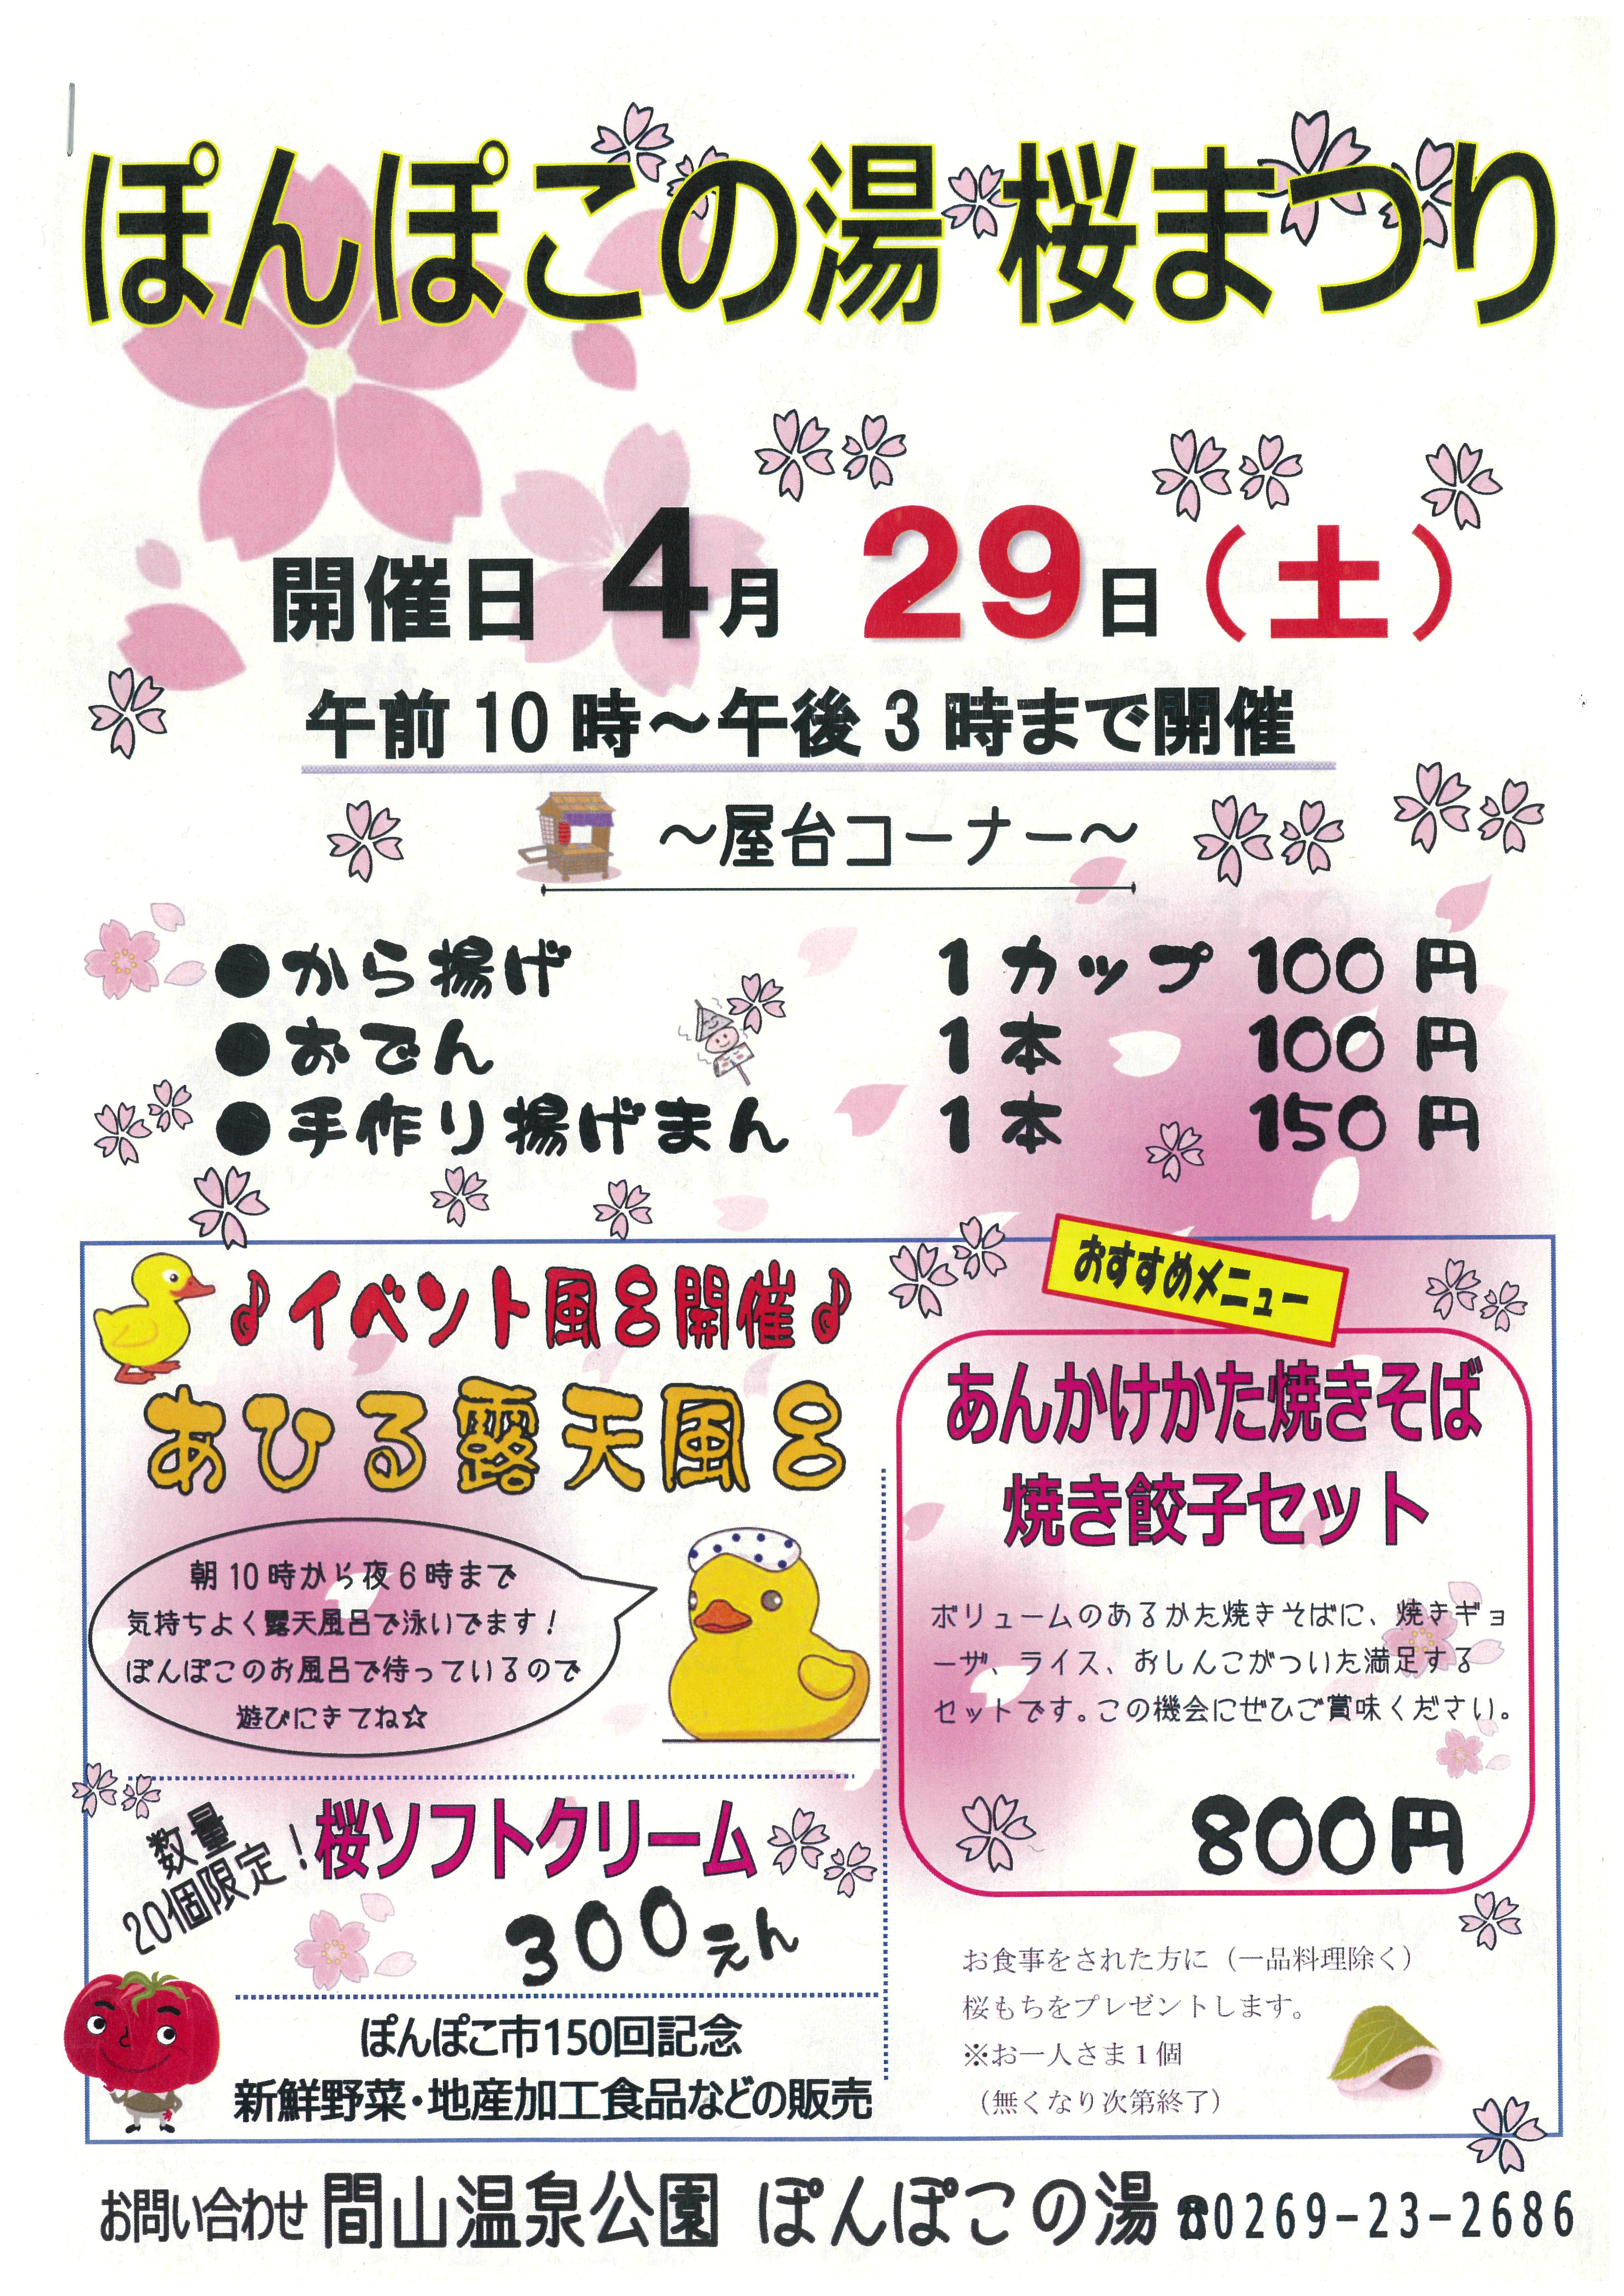 H29 ぽんぽこ桜まつり